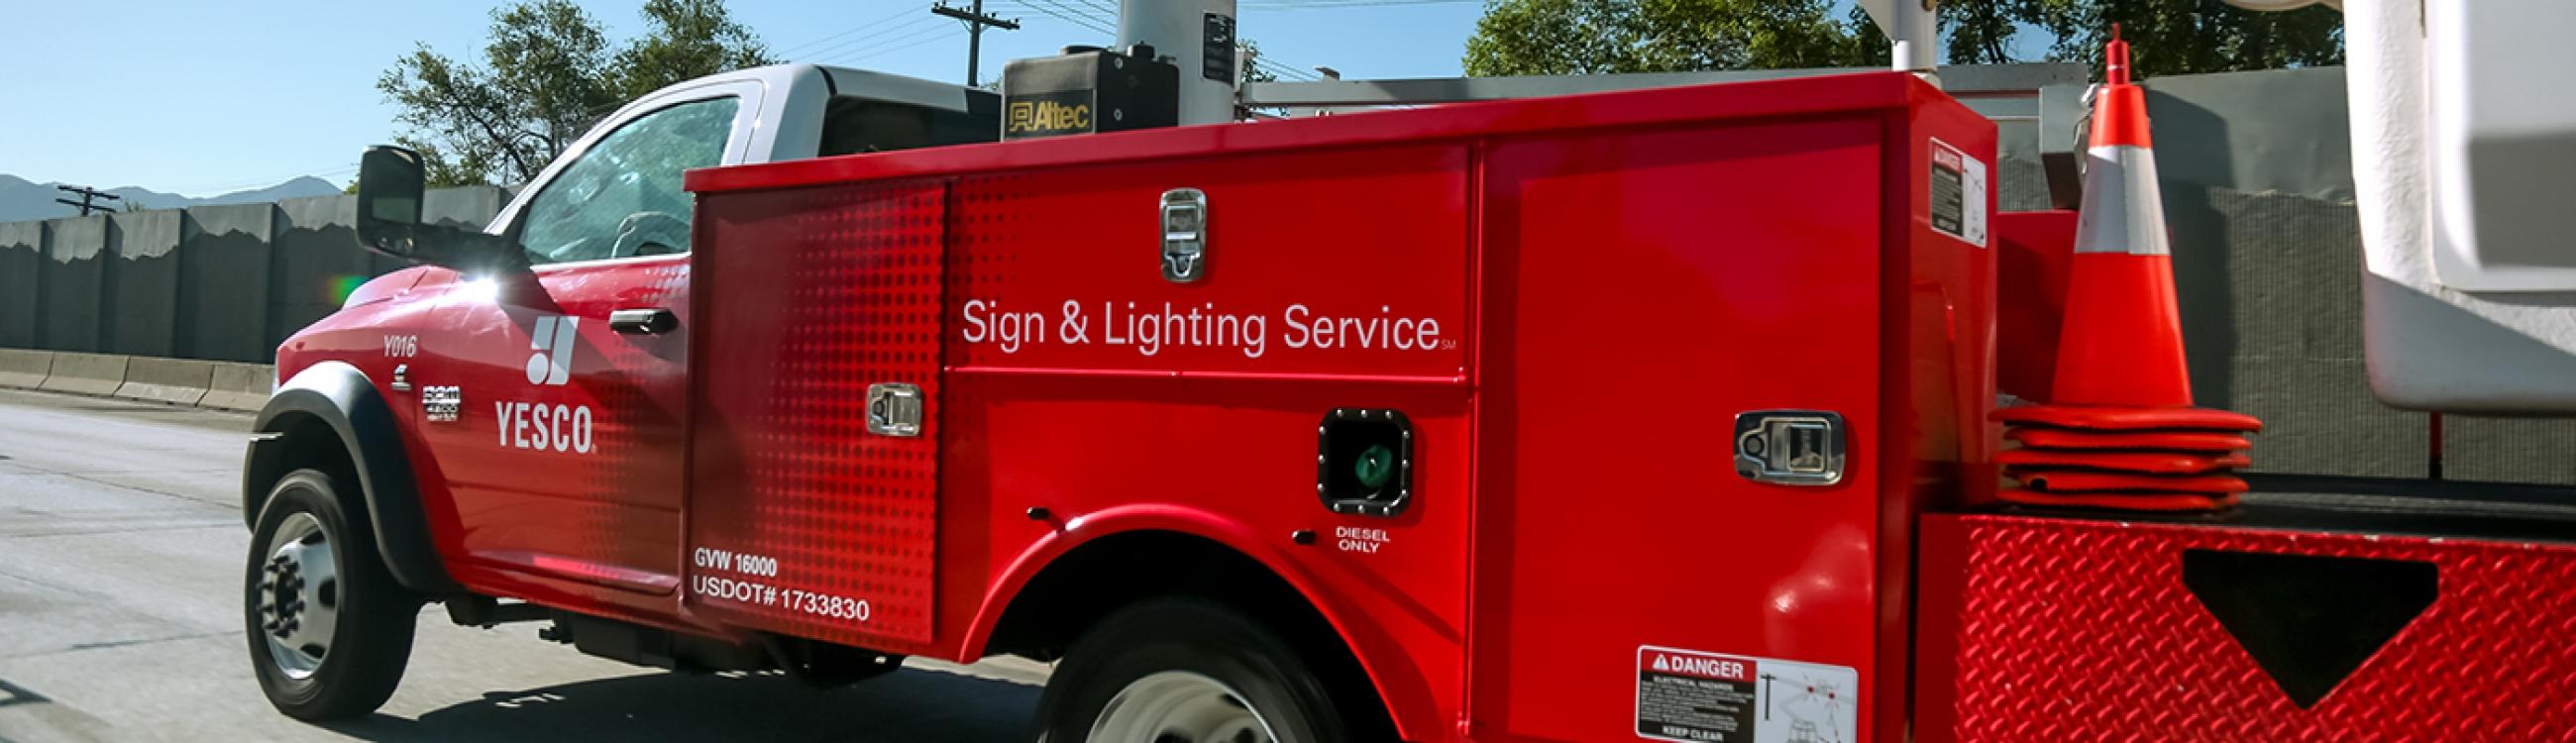 sign & lighting service patrol 2